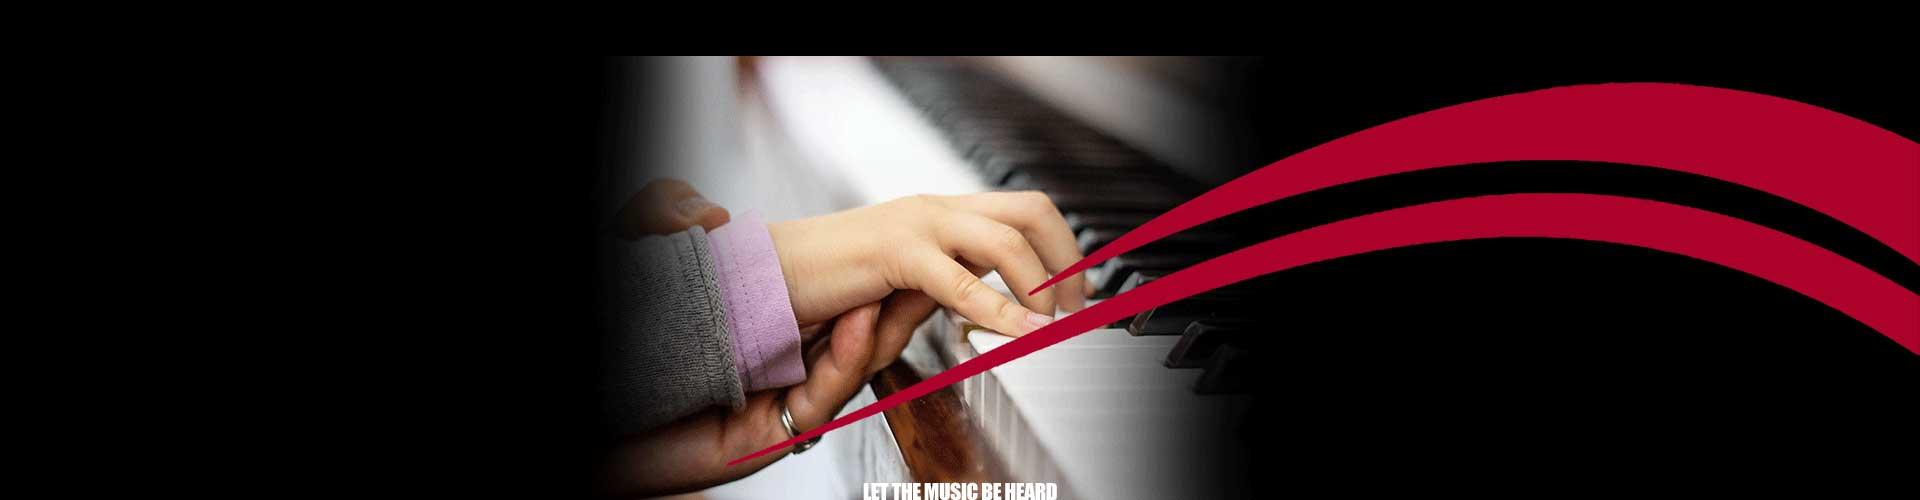 beginner music lessons in Abu Dhabi